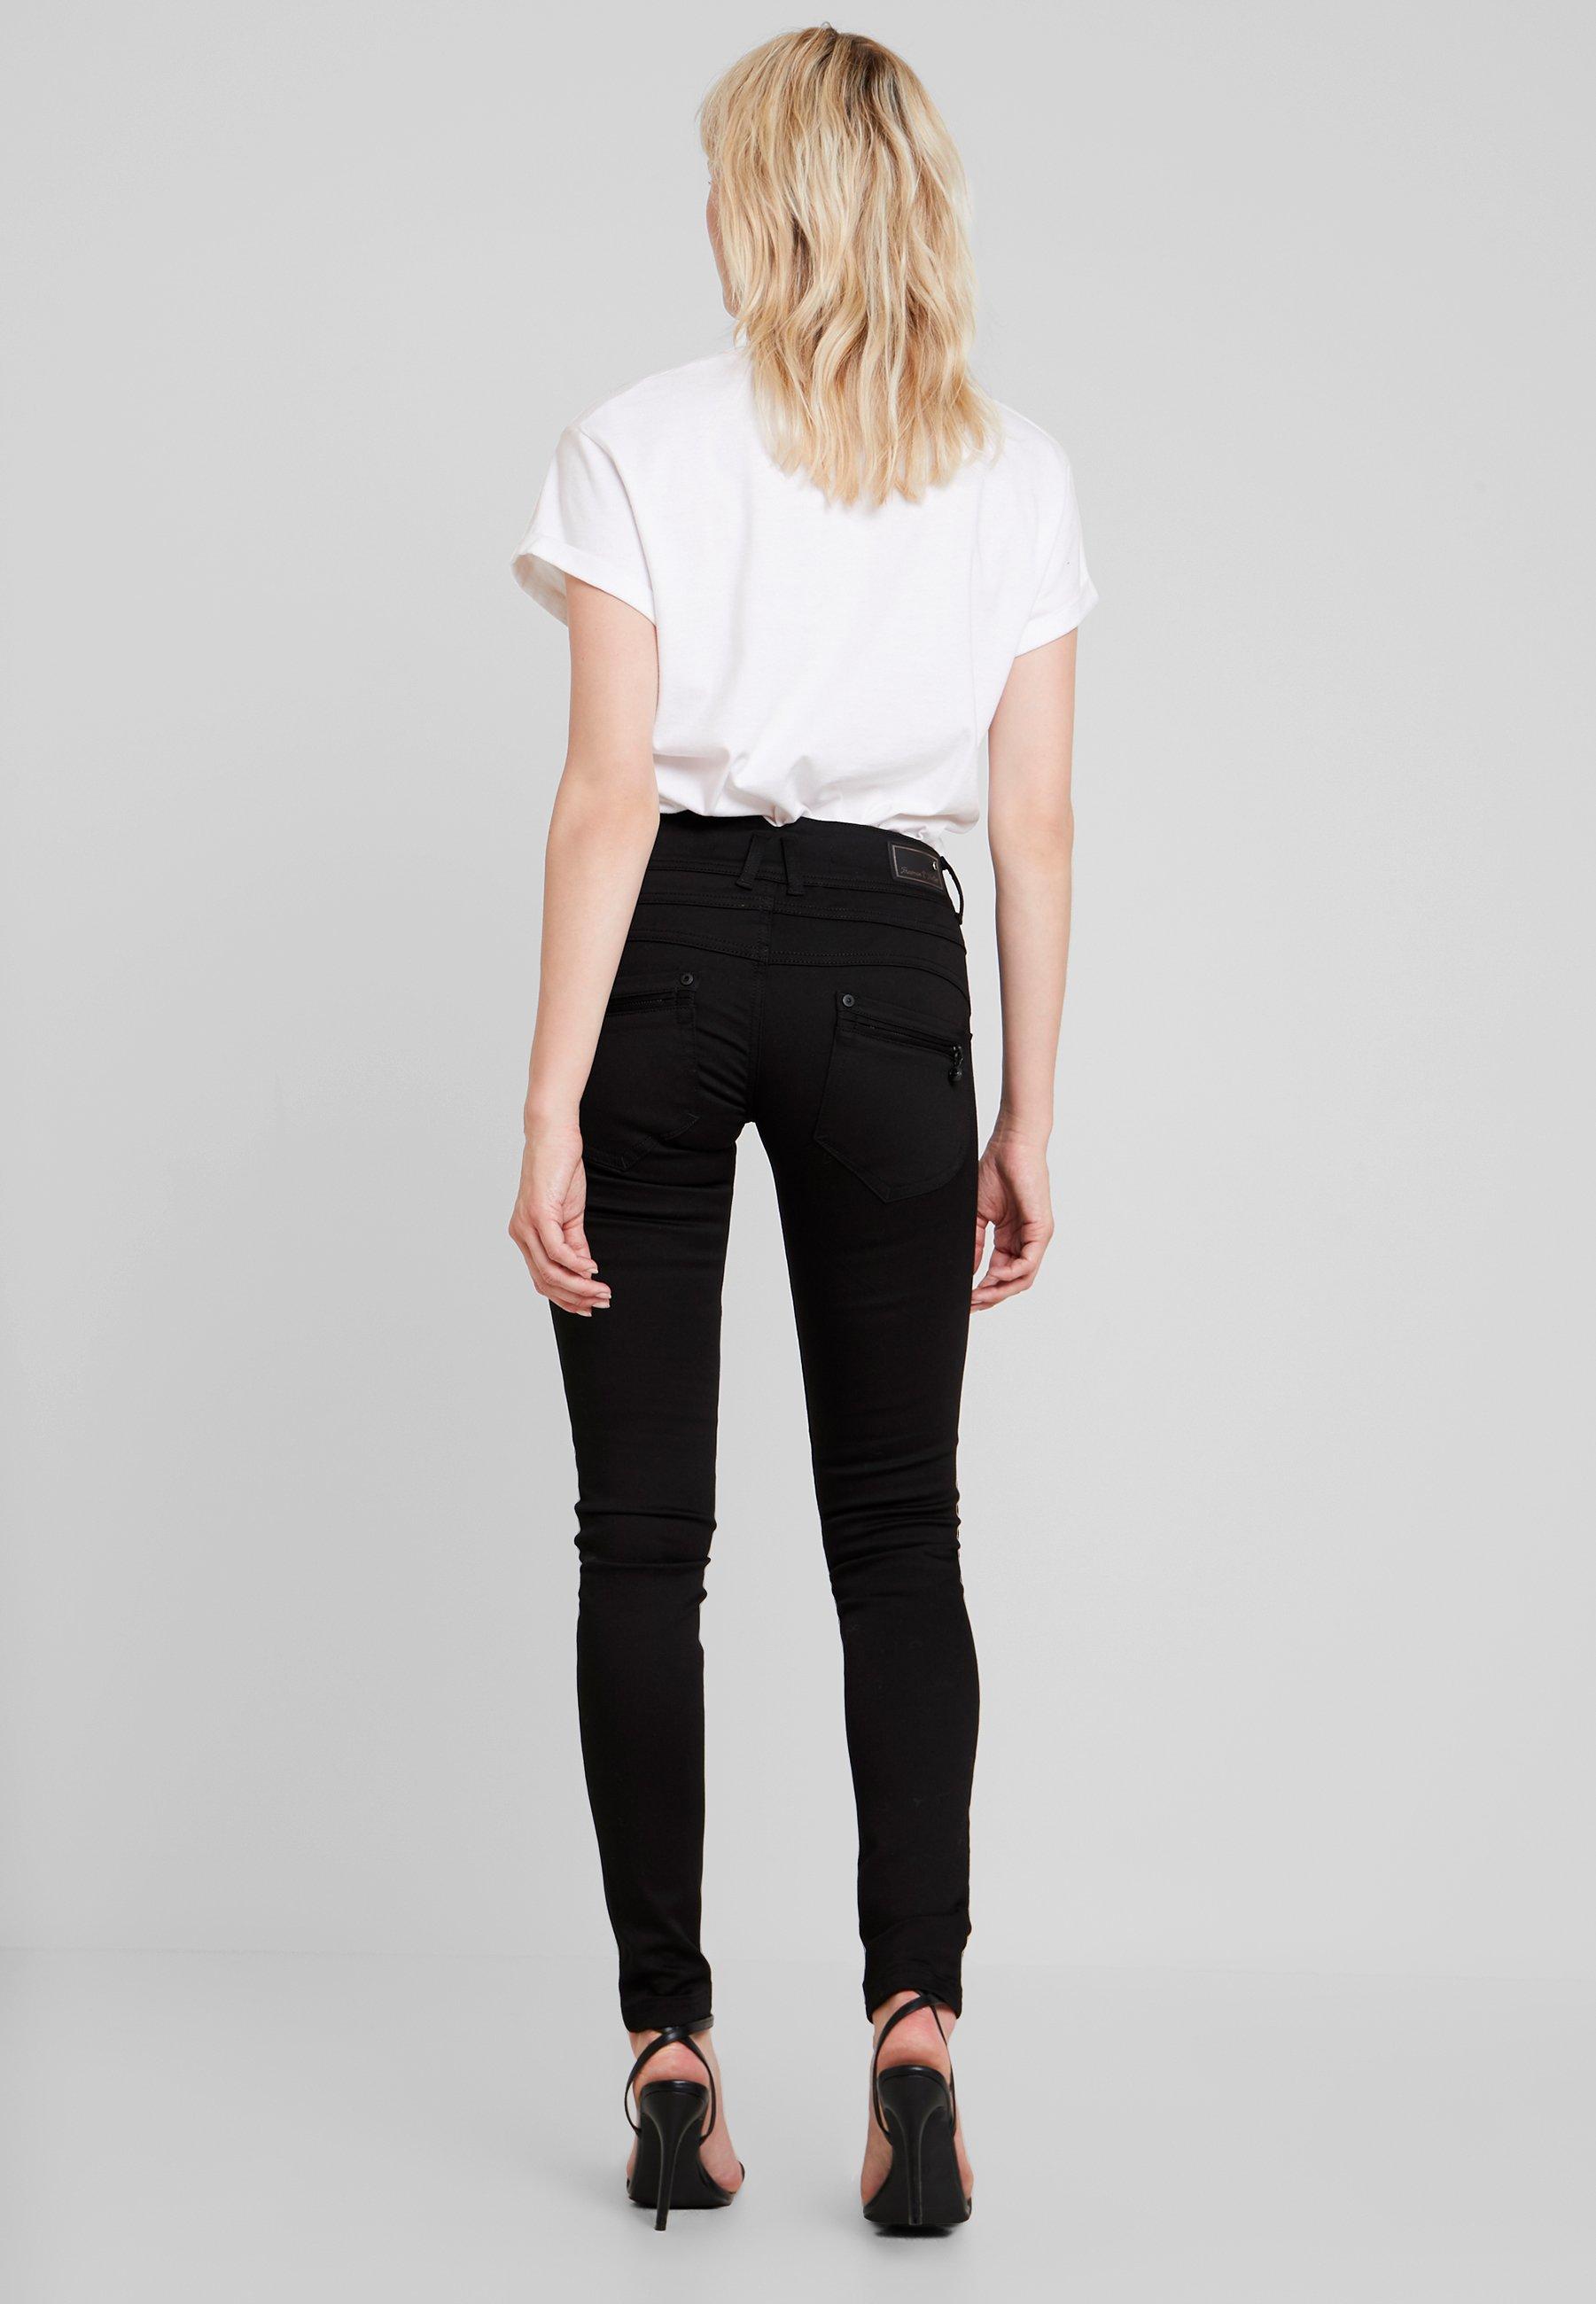 Freeman T. Porter COREENA - Jean slim - stay dark - Jeans Femme 8f48Z